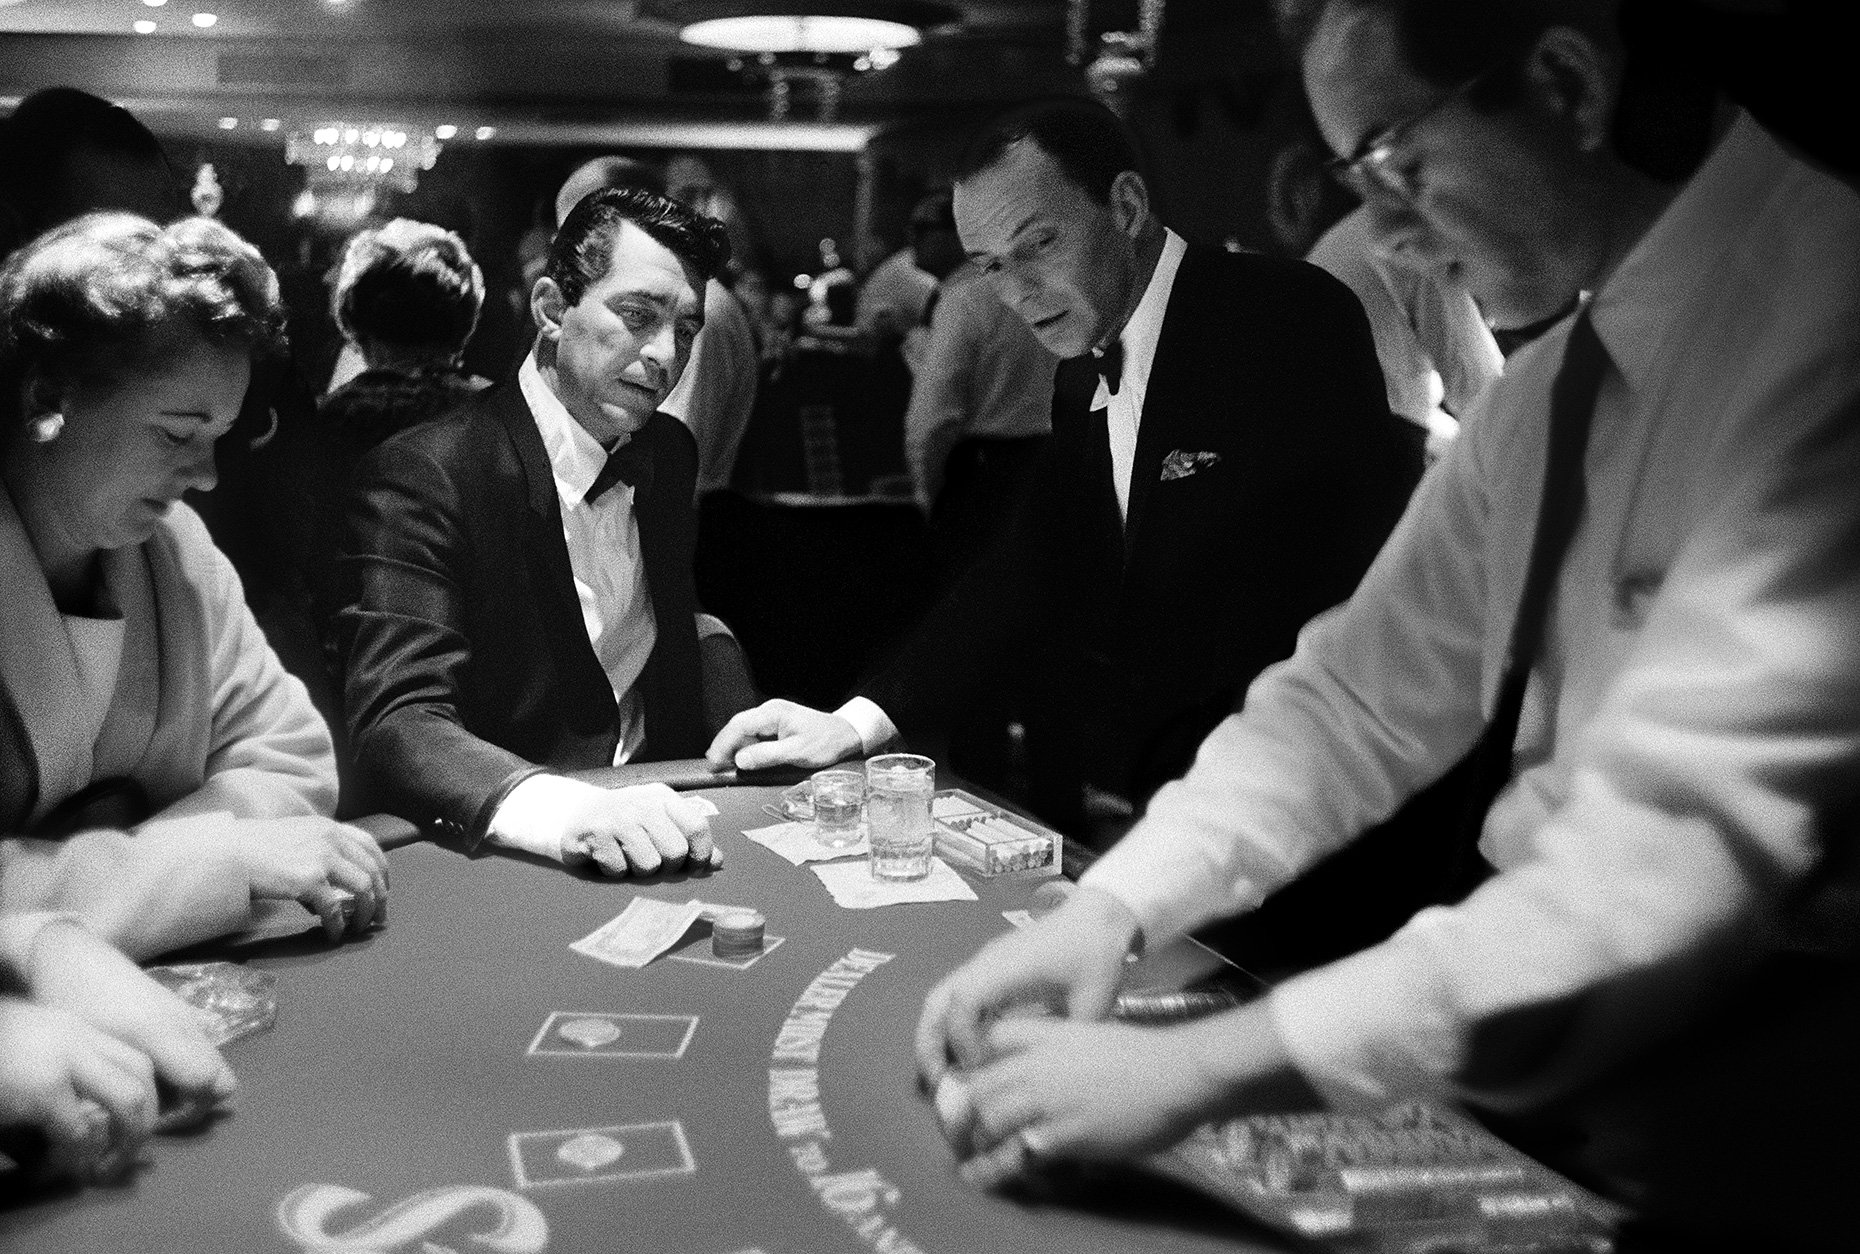 10 Things We Learned From a Vegas Blackjack Dealer On Reddit